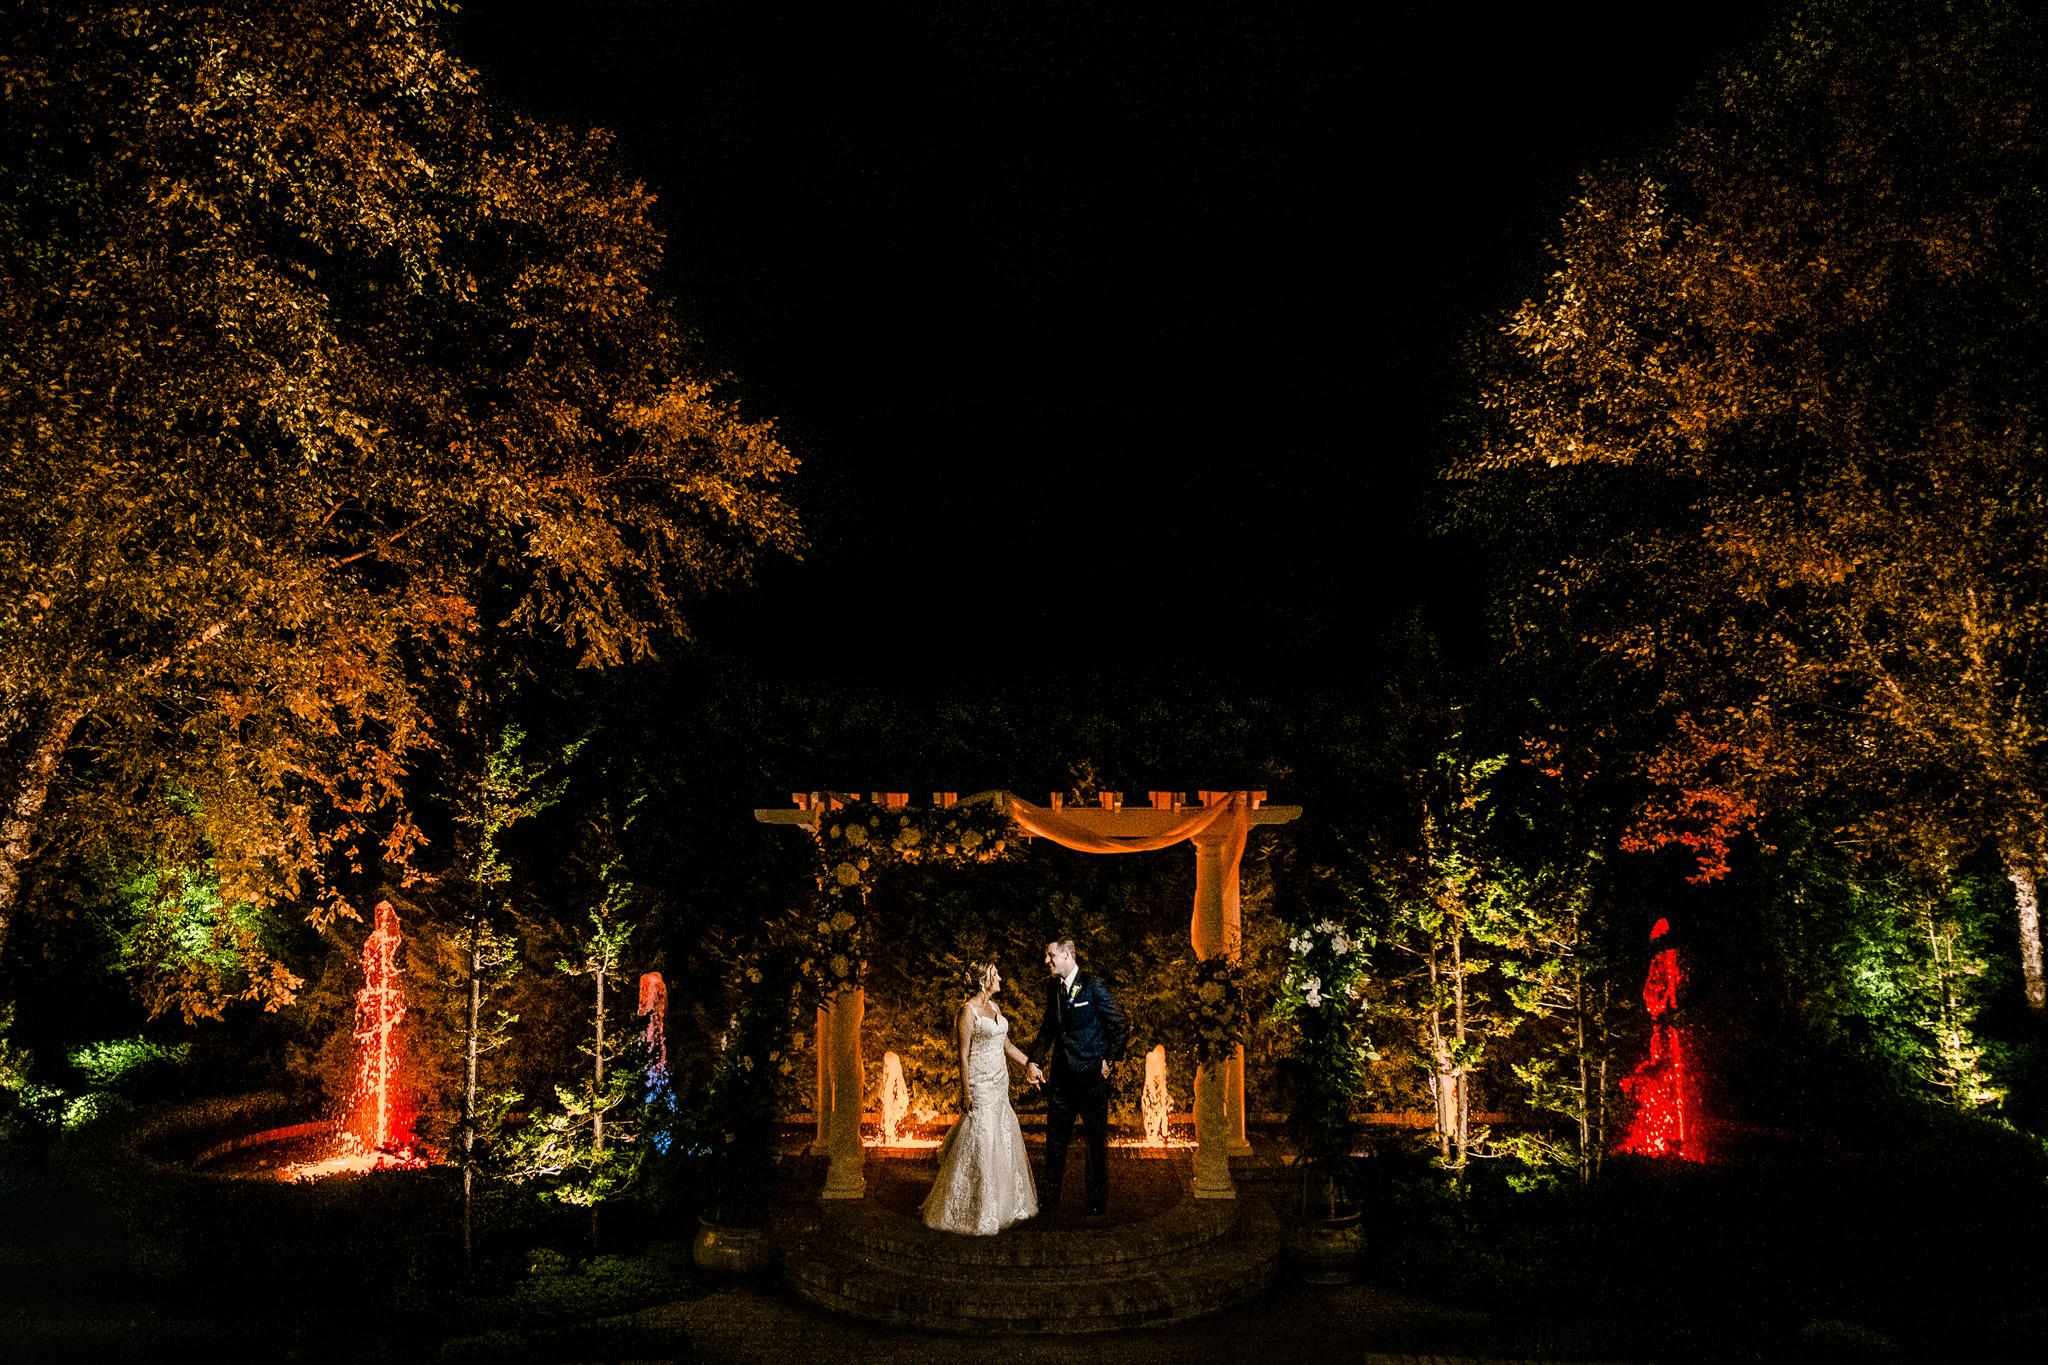 Brennan-South-Gate-Manor-New-Jersey-Wedding-Photographer-43.JPG